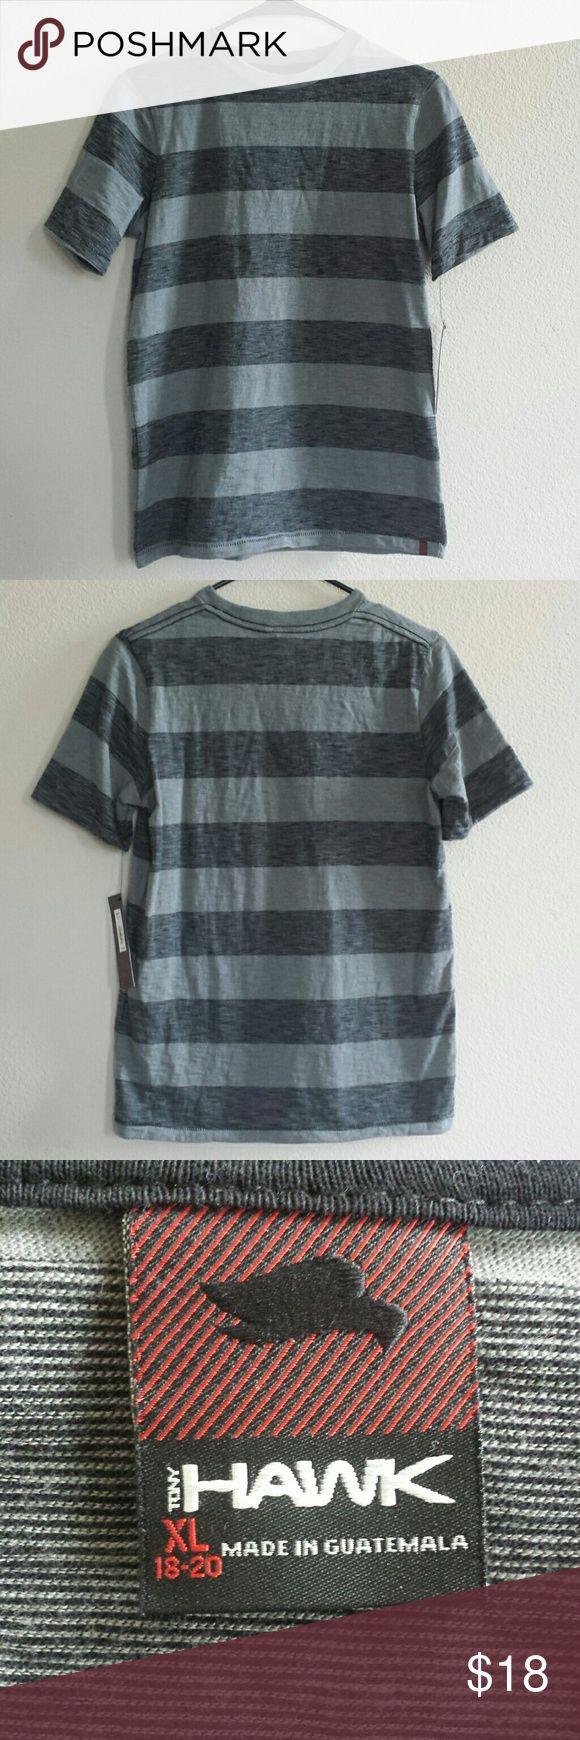 NWT Boys Tony Hawk Shirt NWT boys, size XL (18-20) shirt Tony Hawk Shirts & Tops